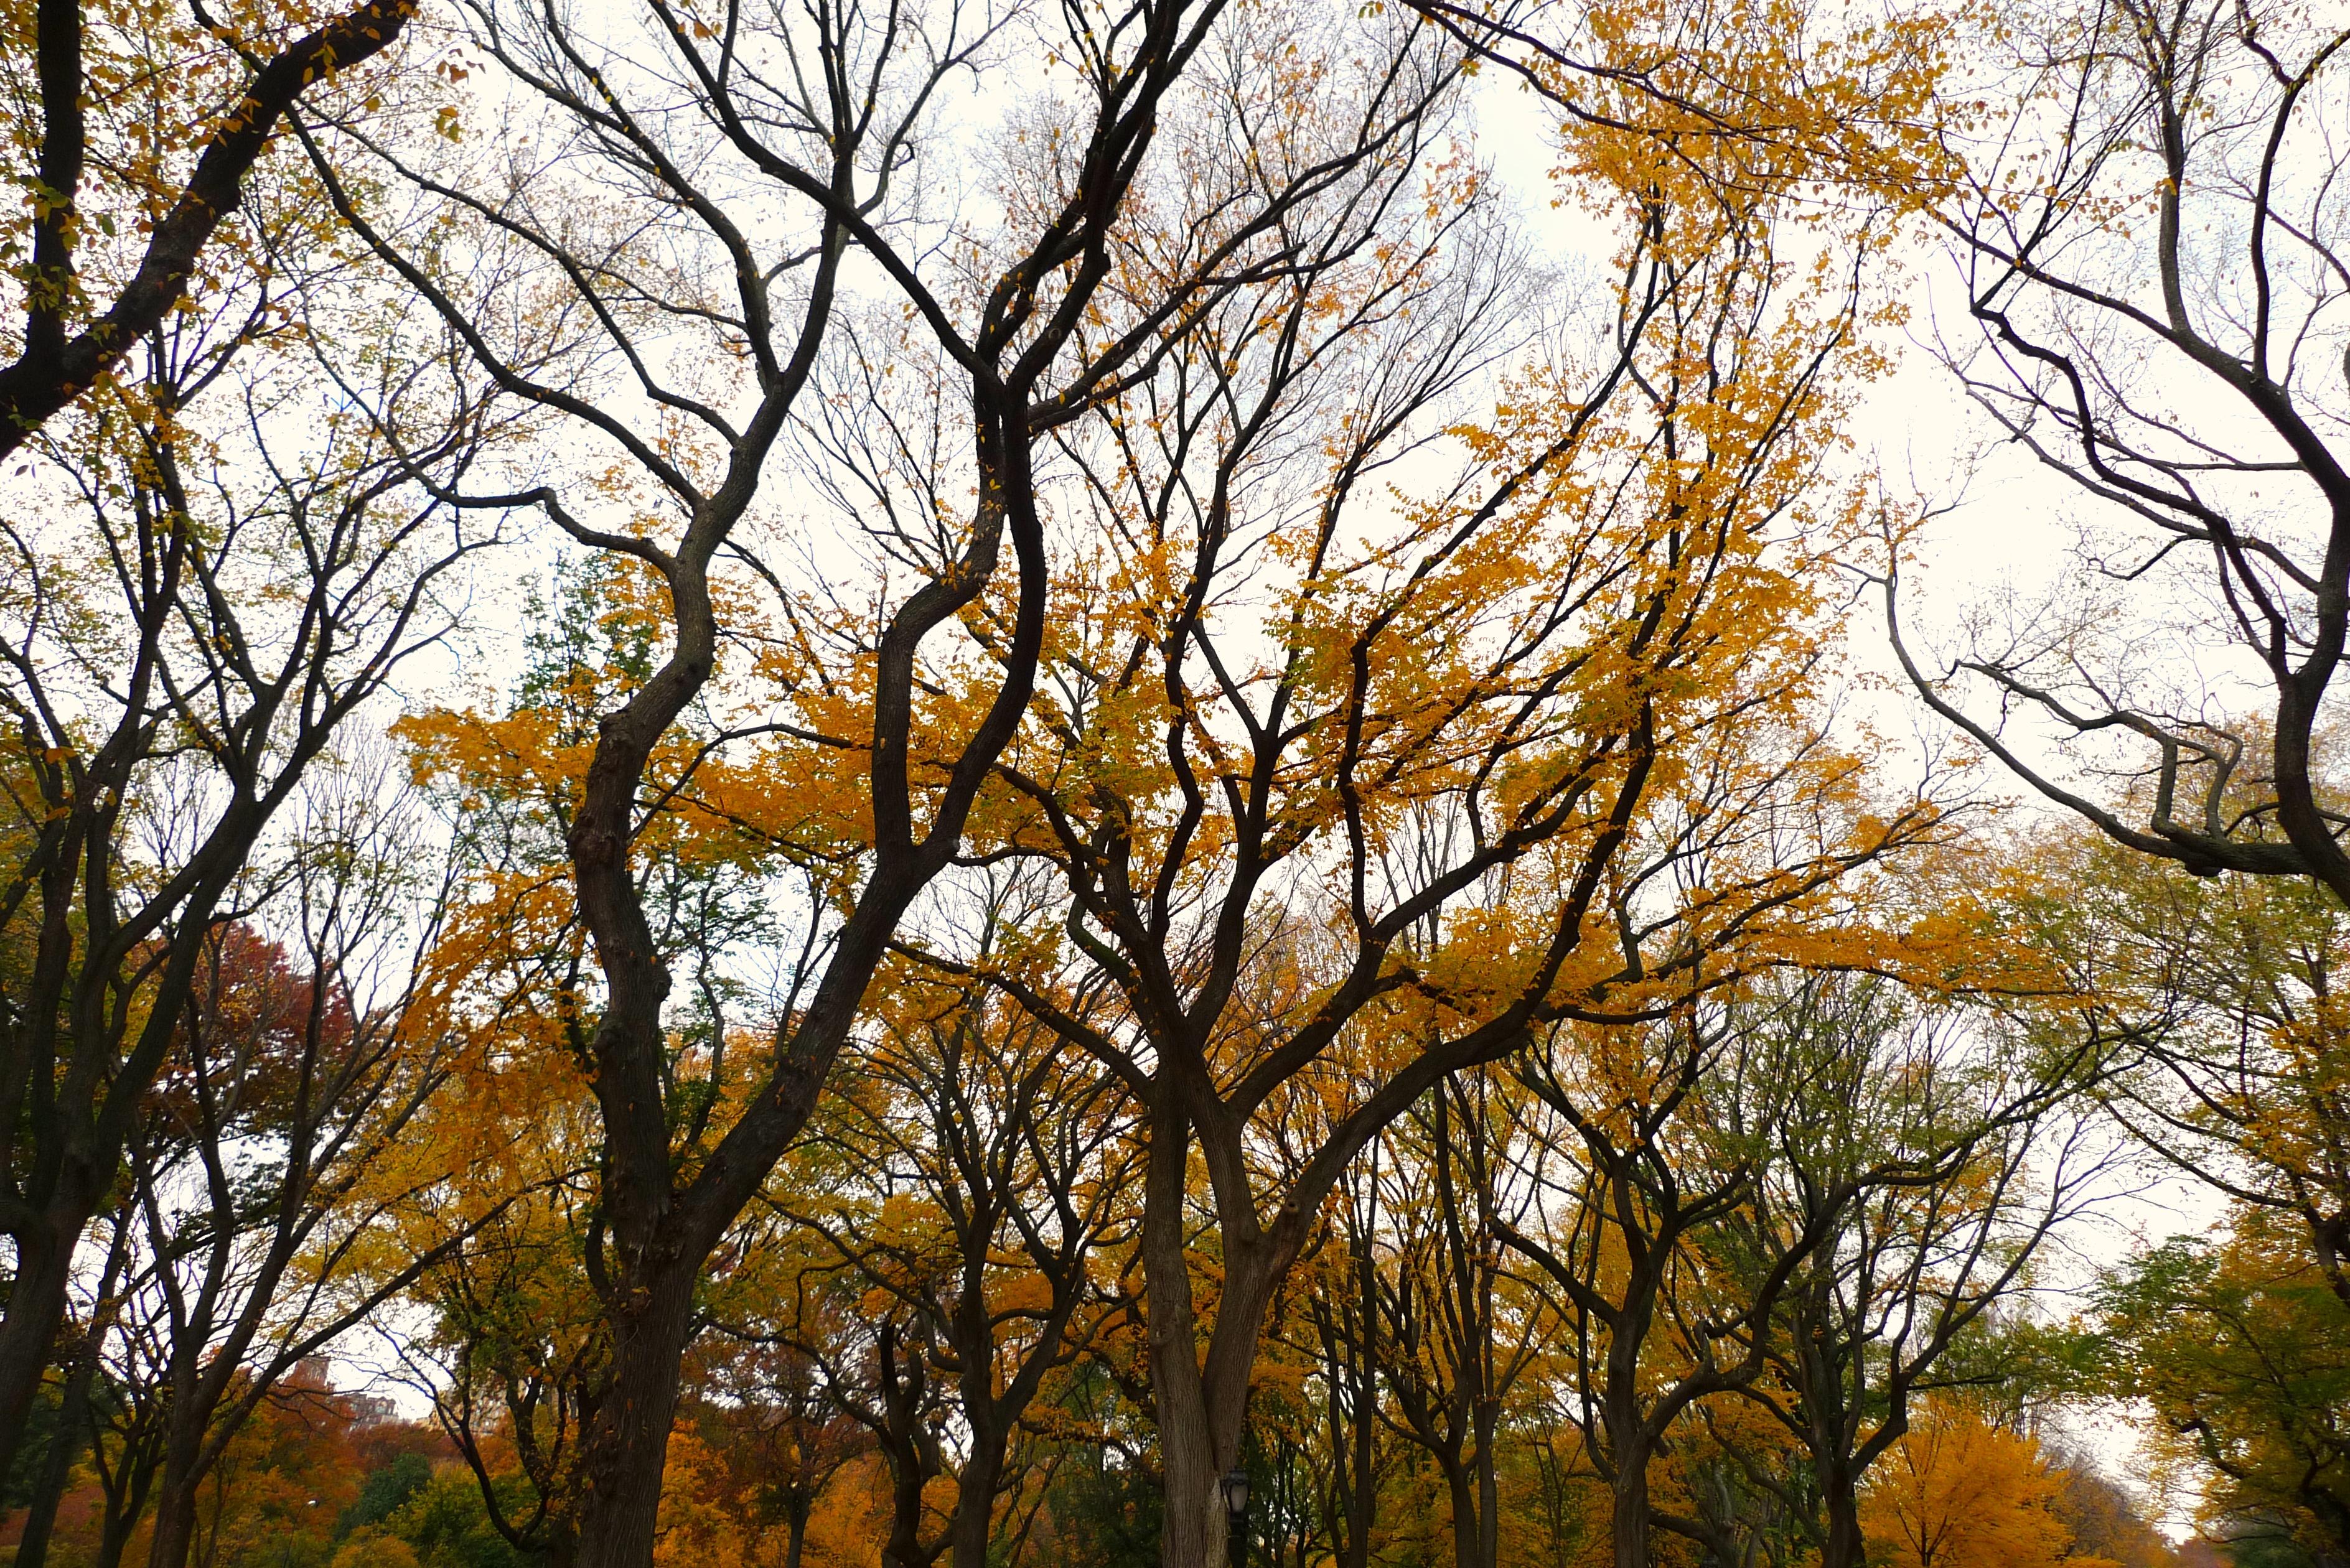 central park, 5 november